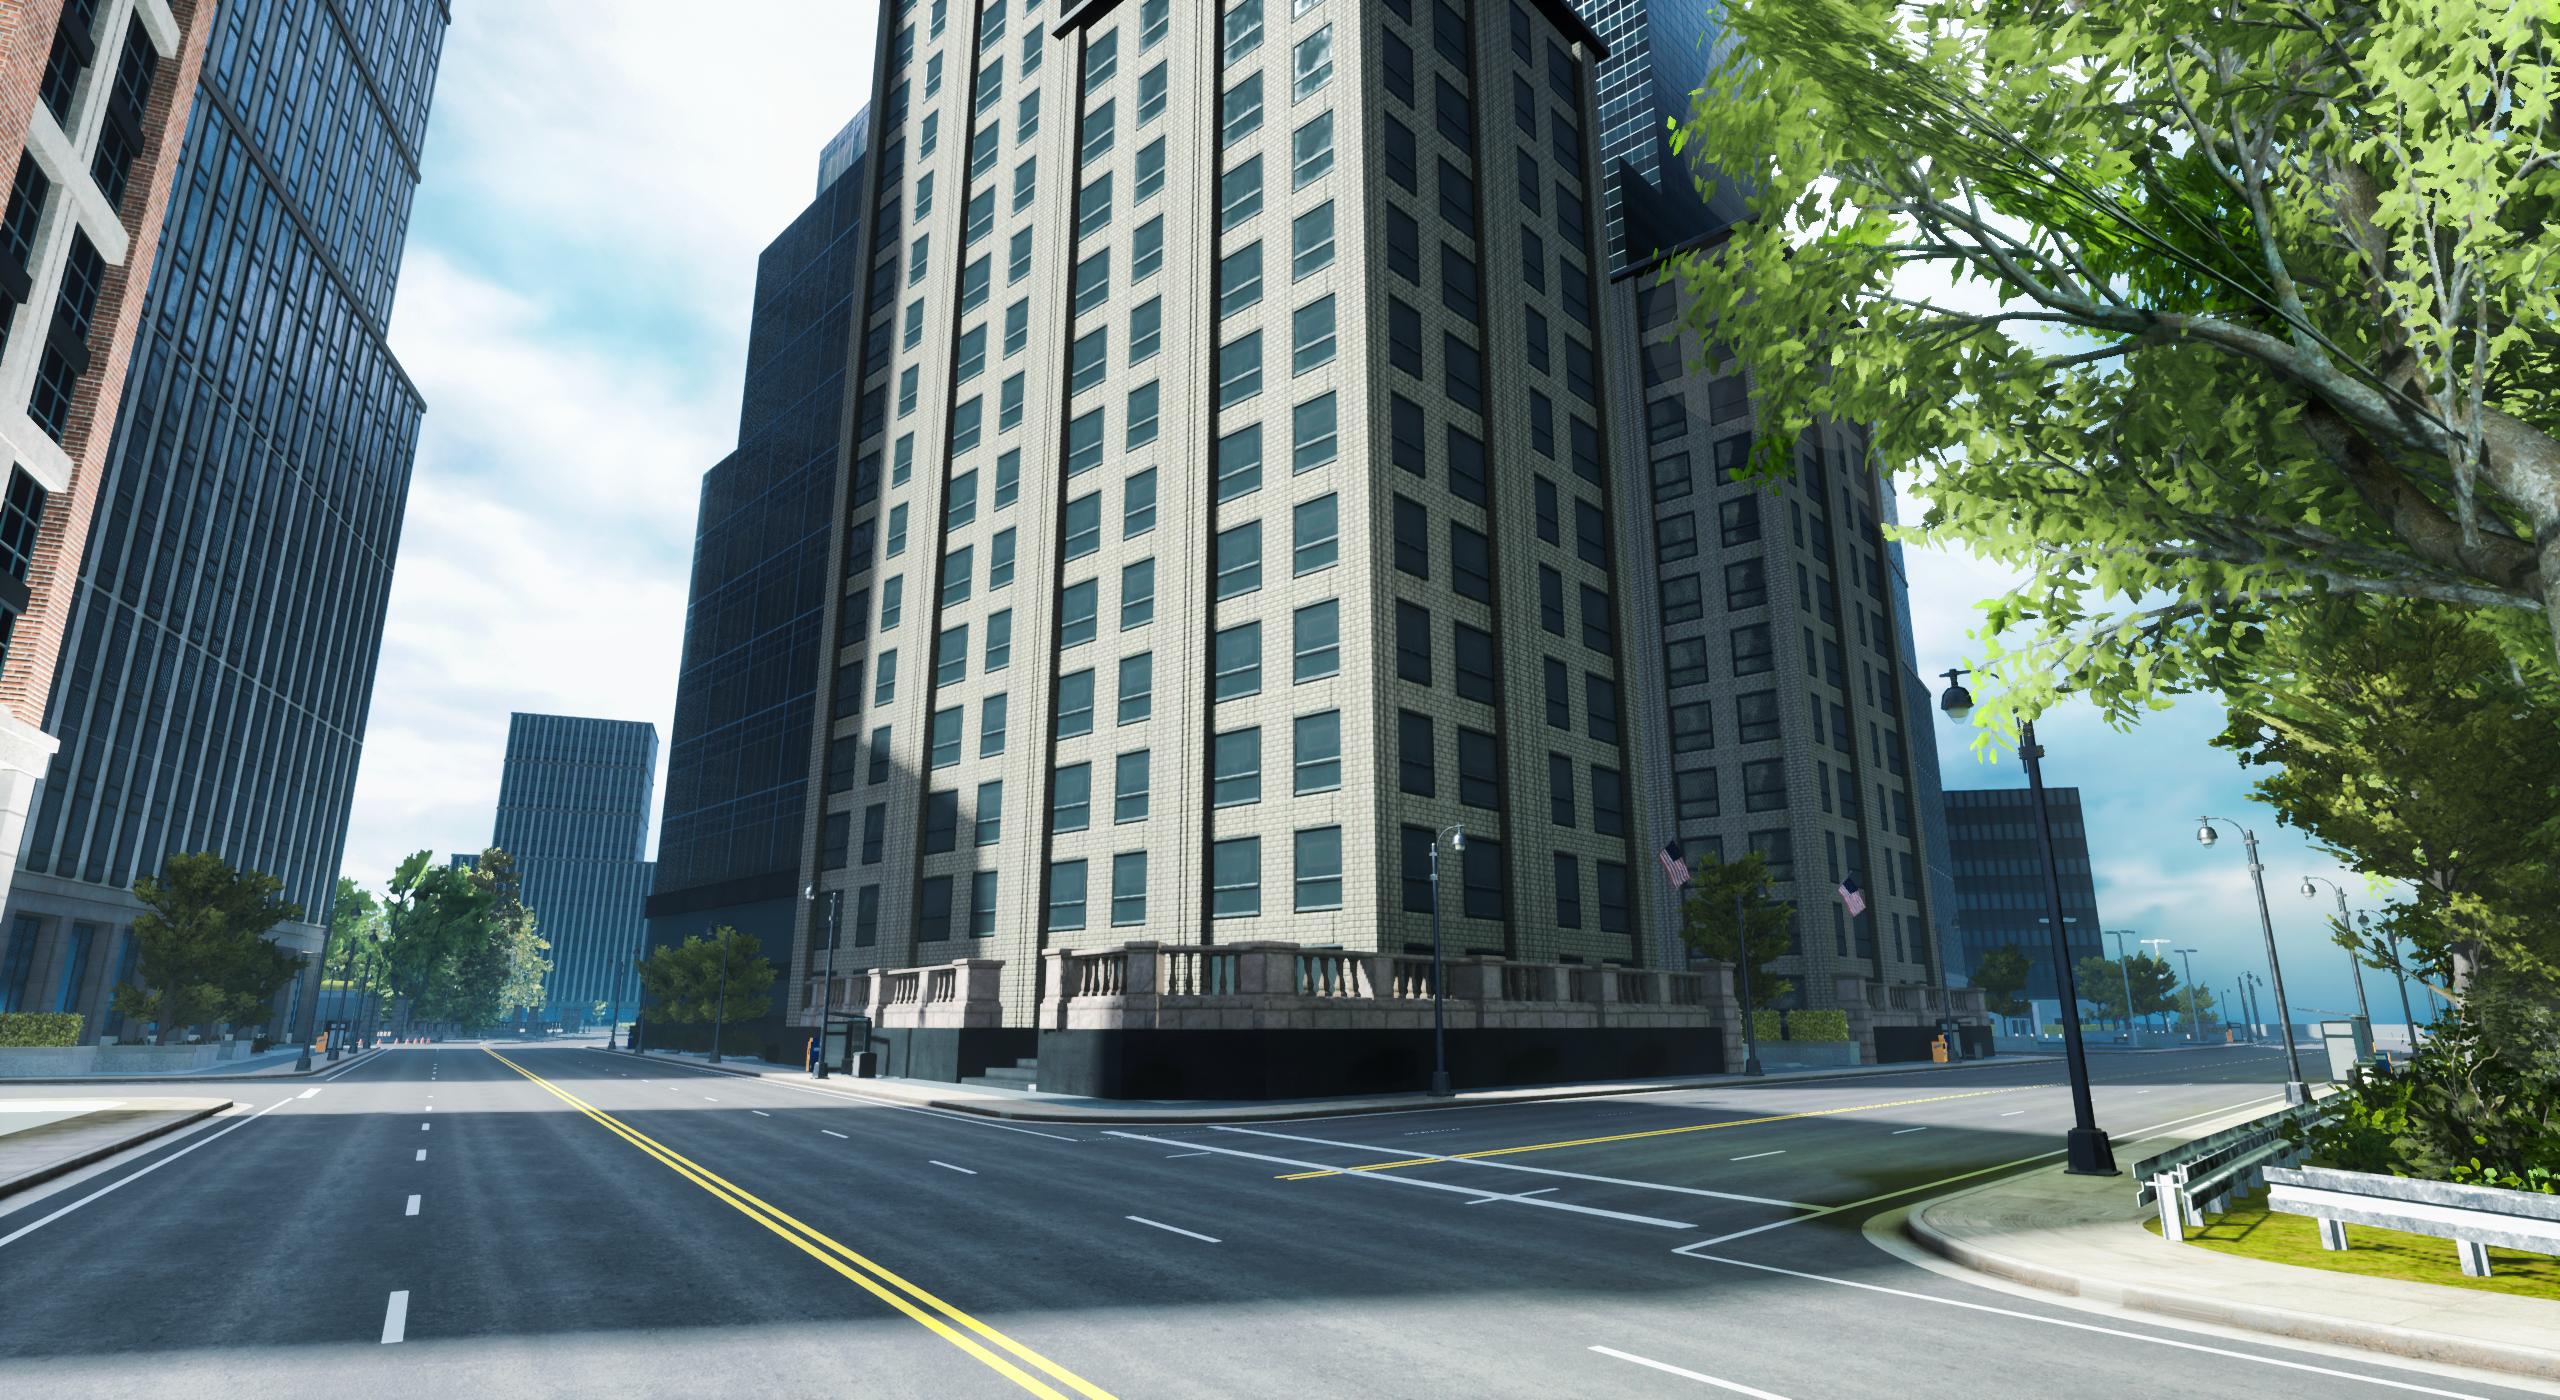 CityBuildings_004